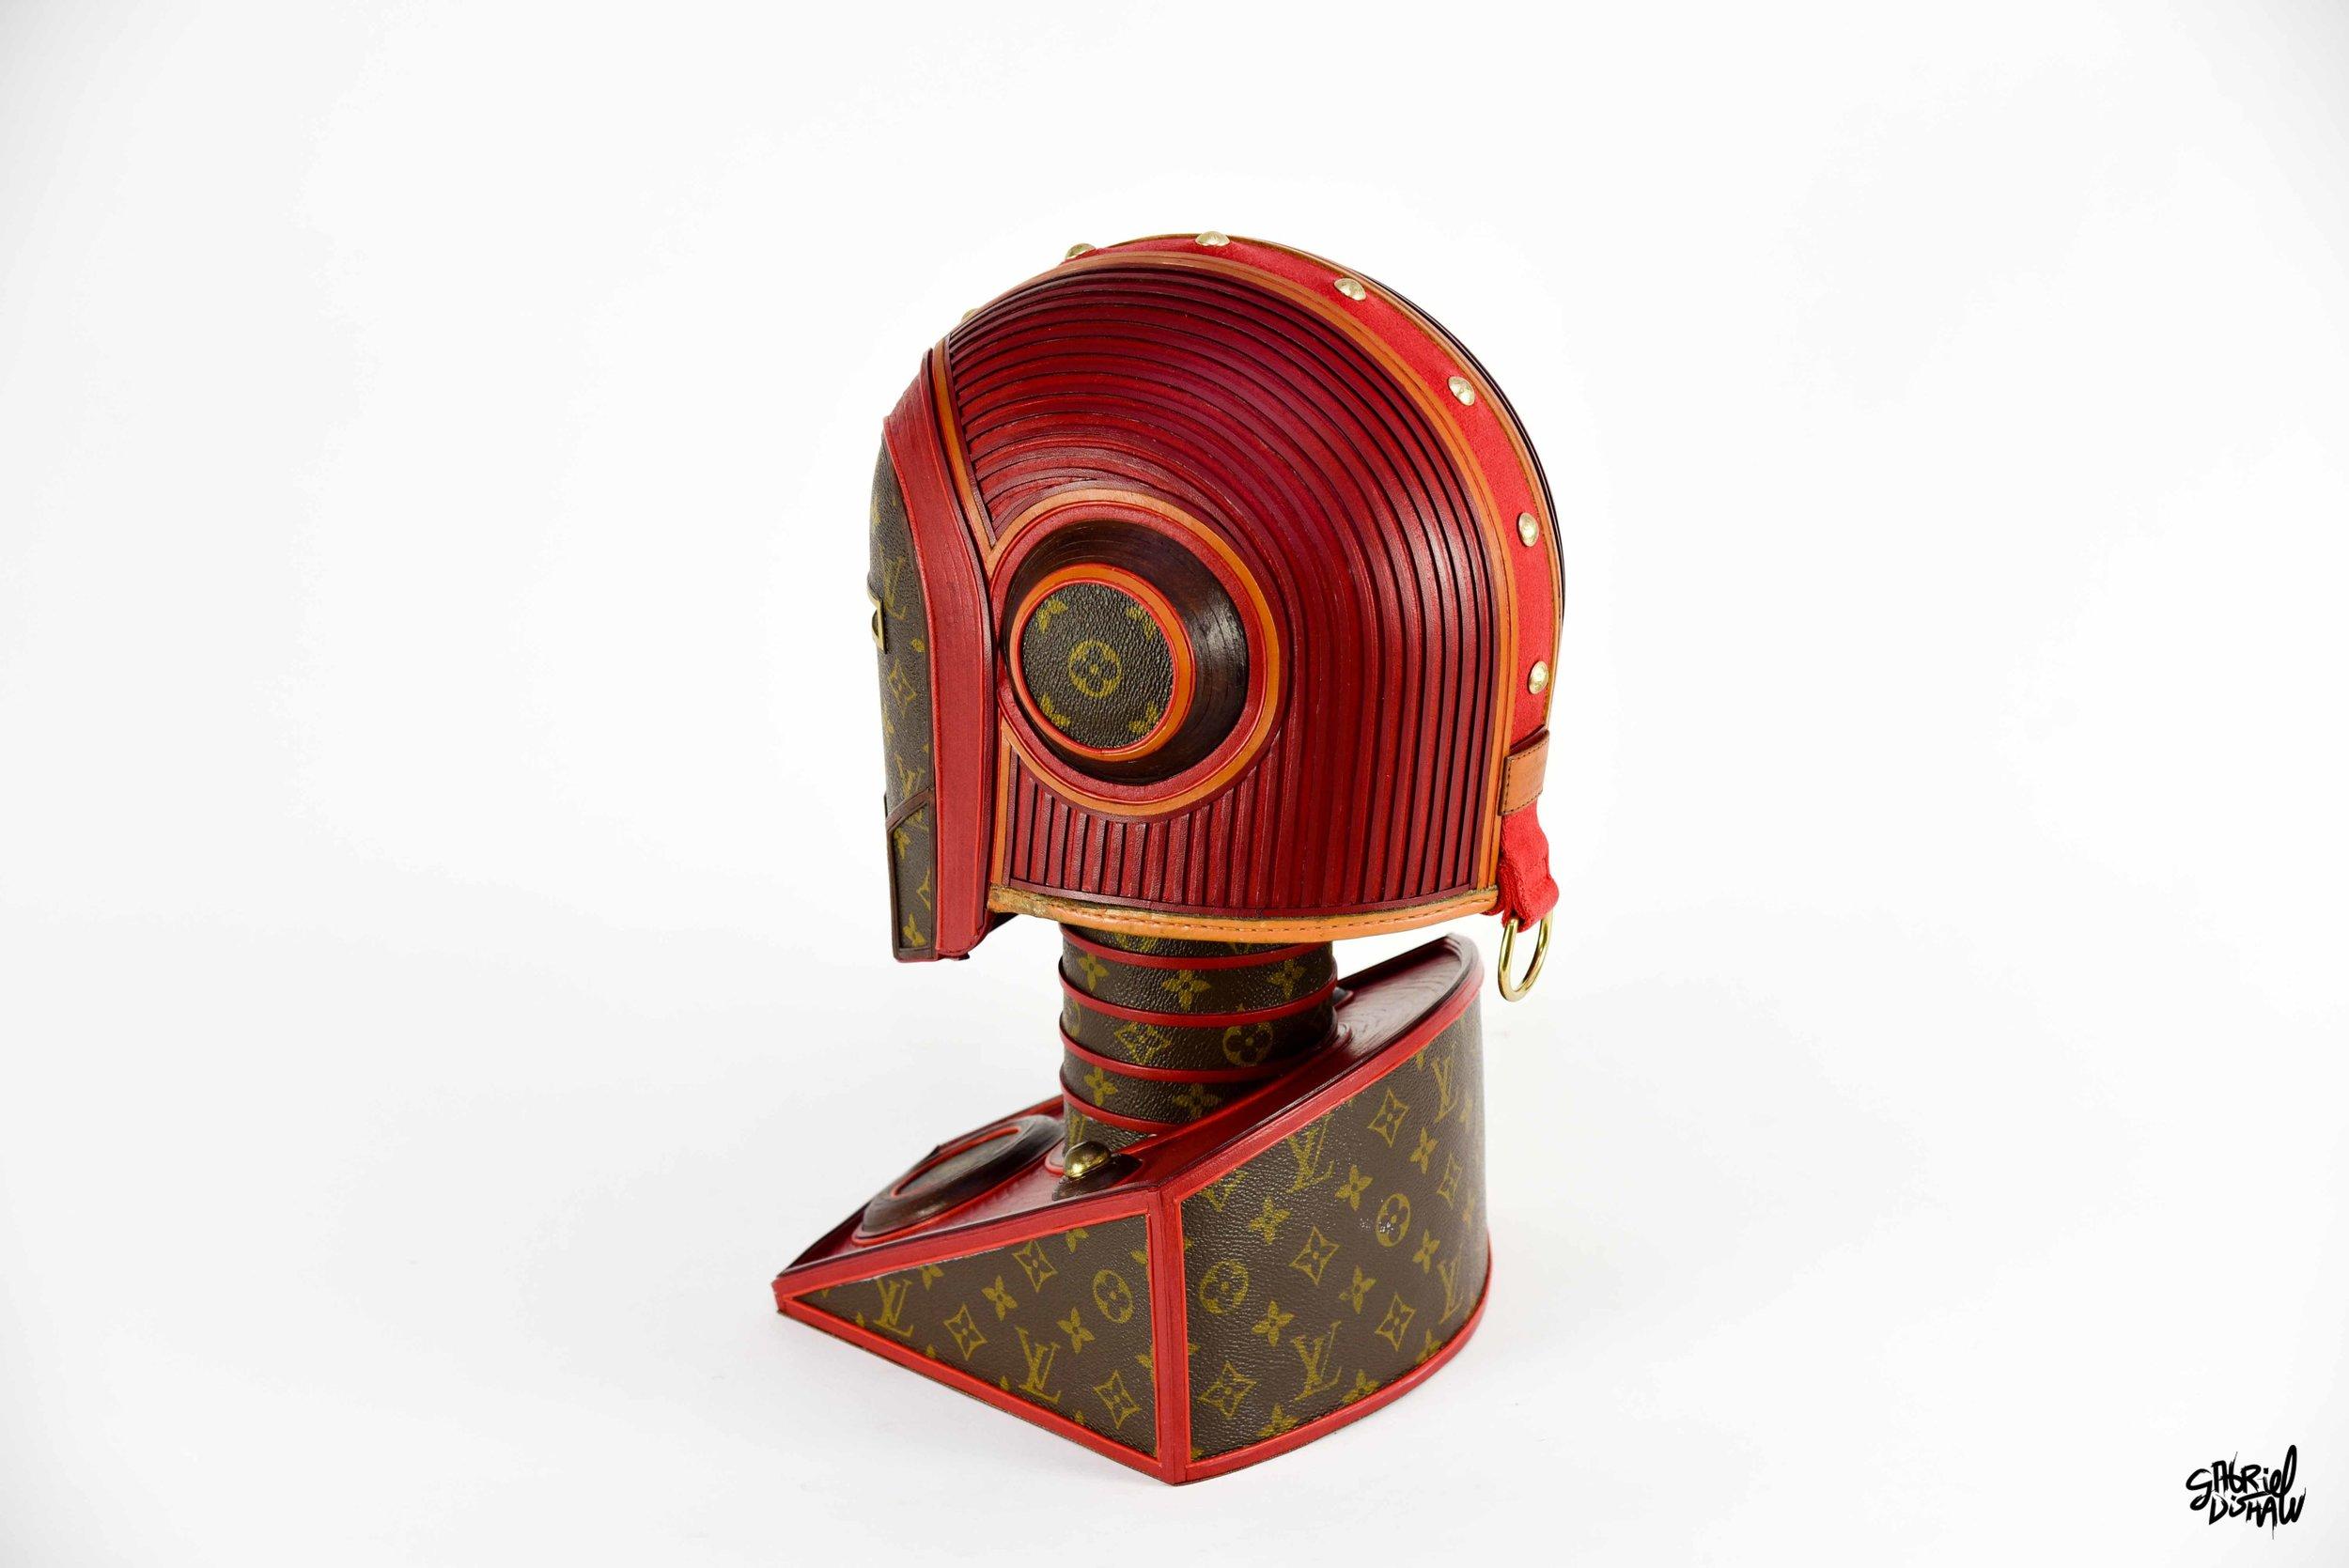 Gabriel Dishaw Vintage Iron Man LV-0125.jpg